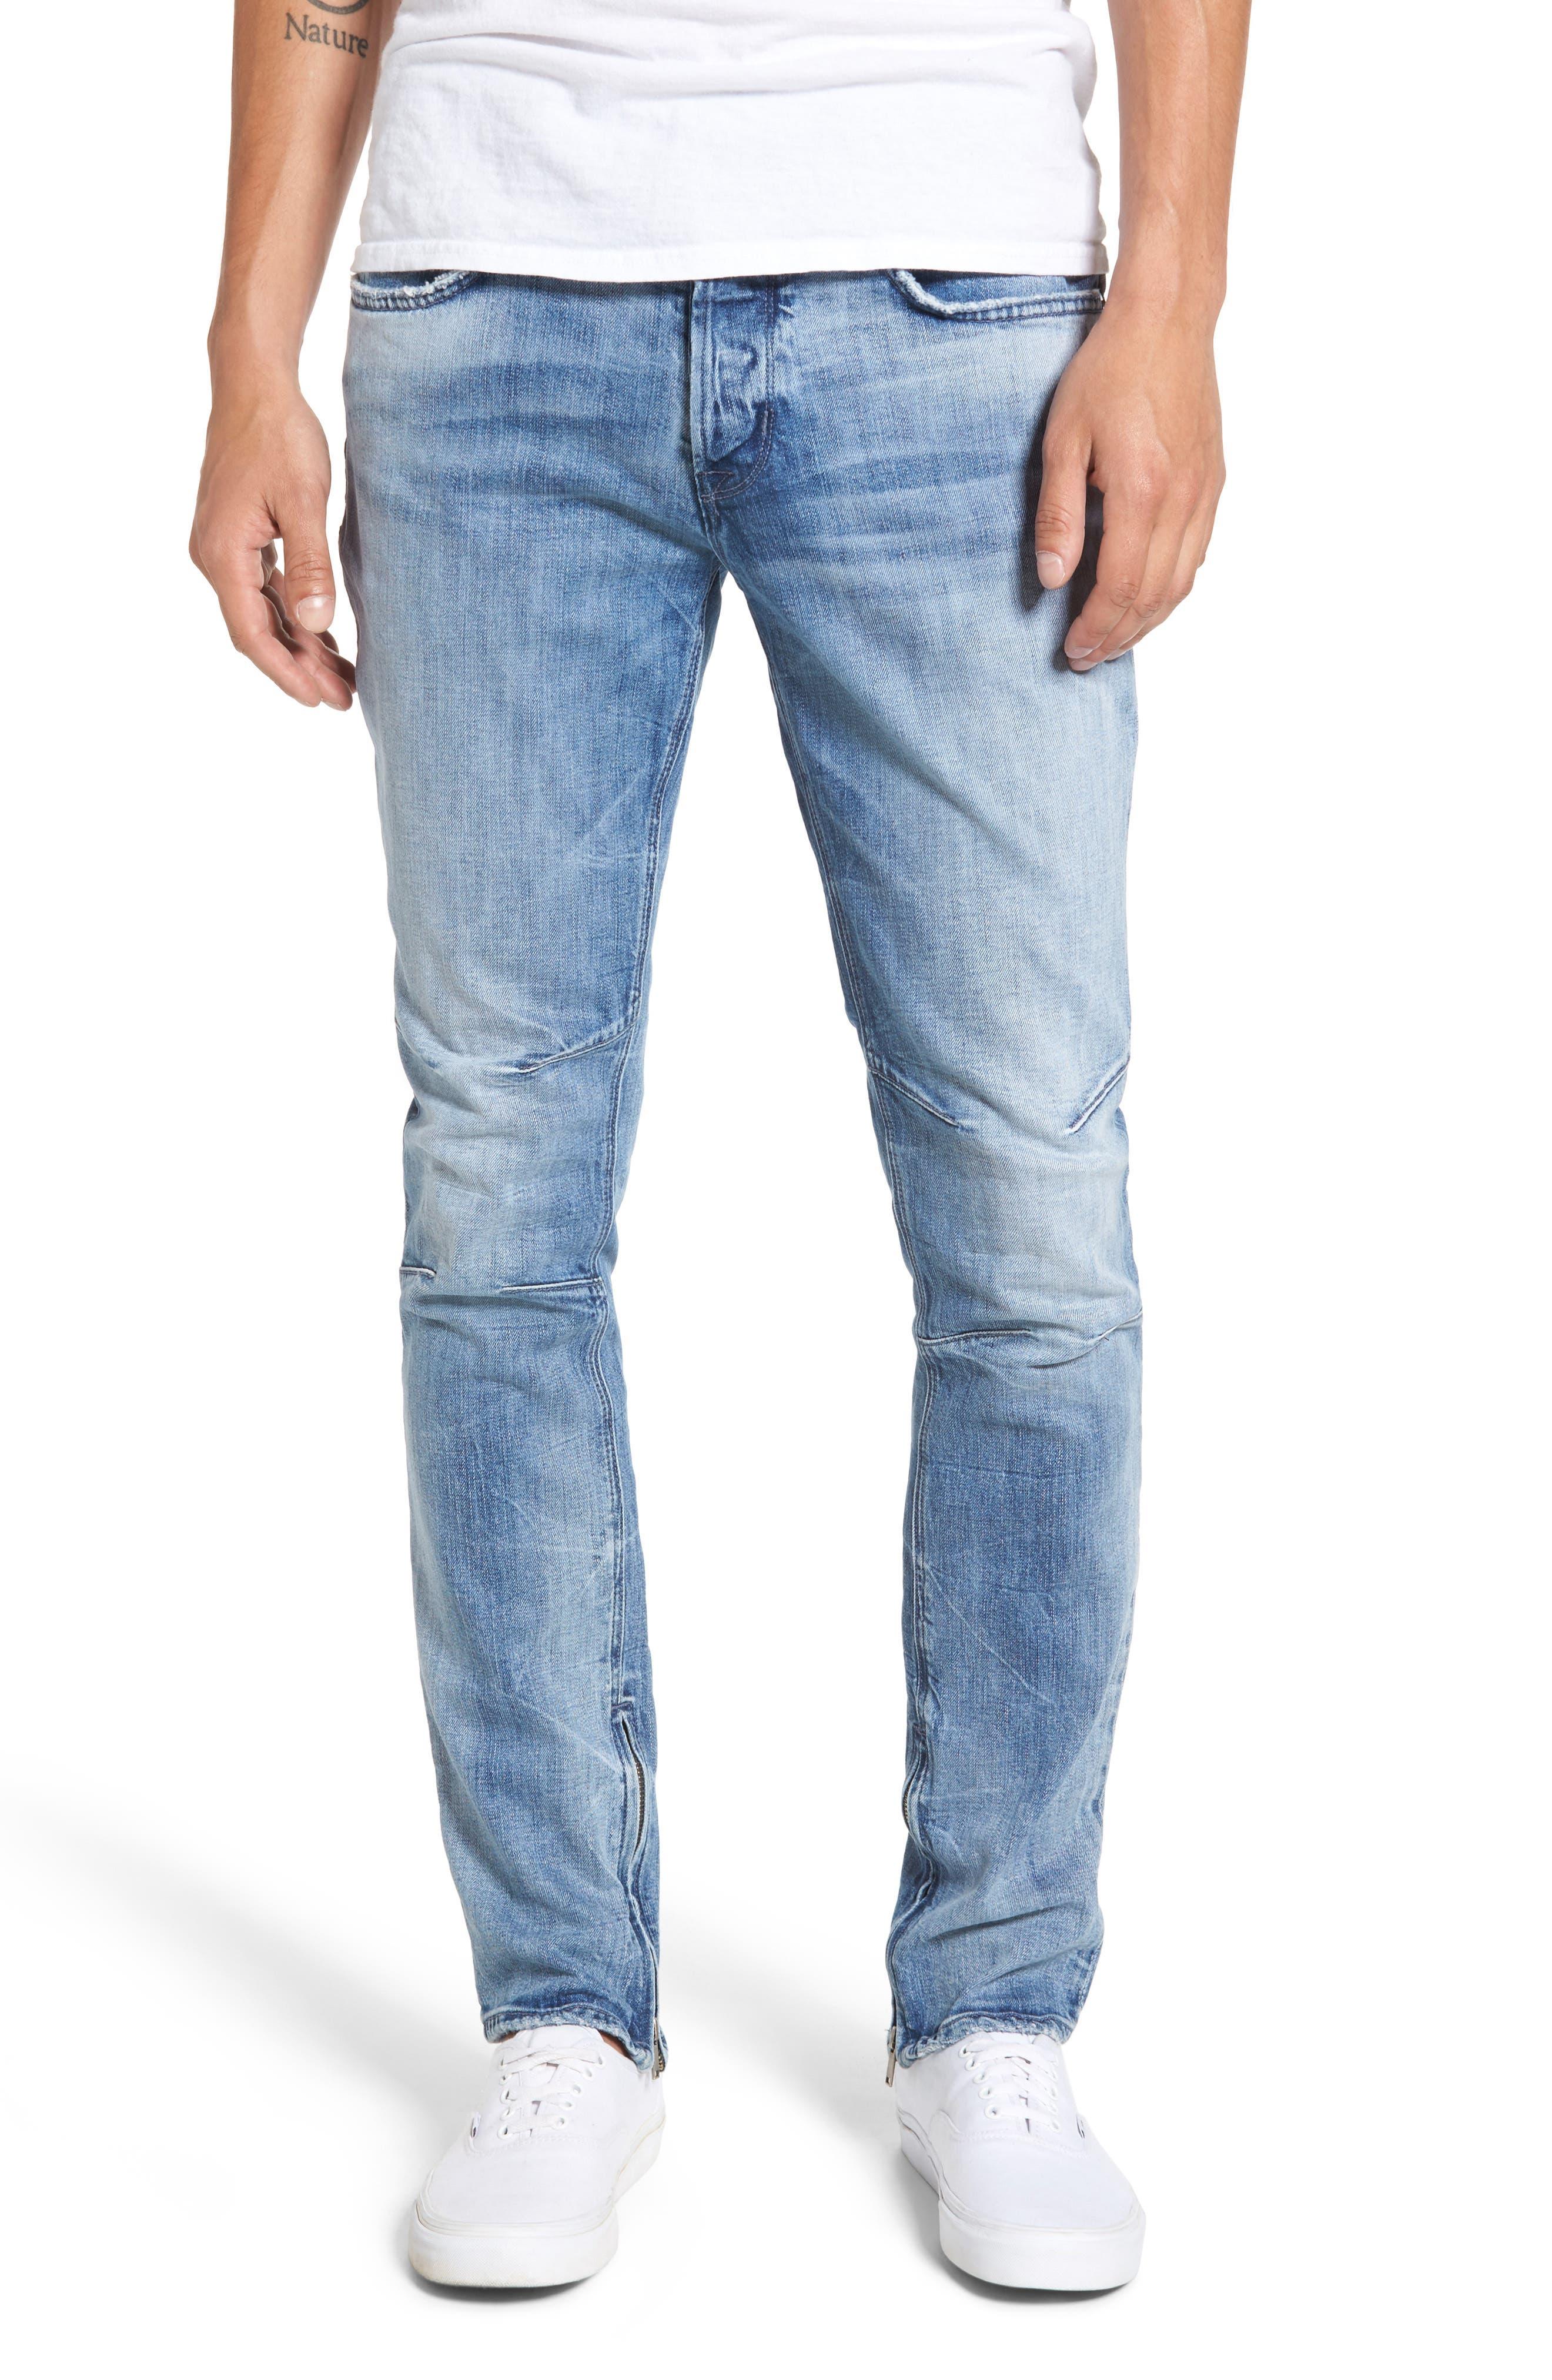 Main Image - Hudson Jeans Vaughn Biker Skinny Fit Jeans (No Remorse)